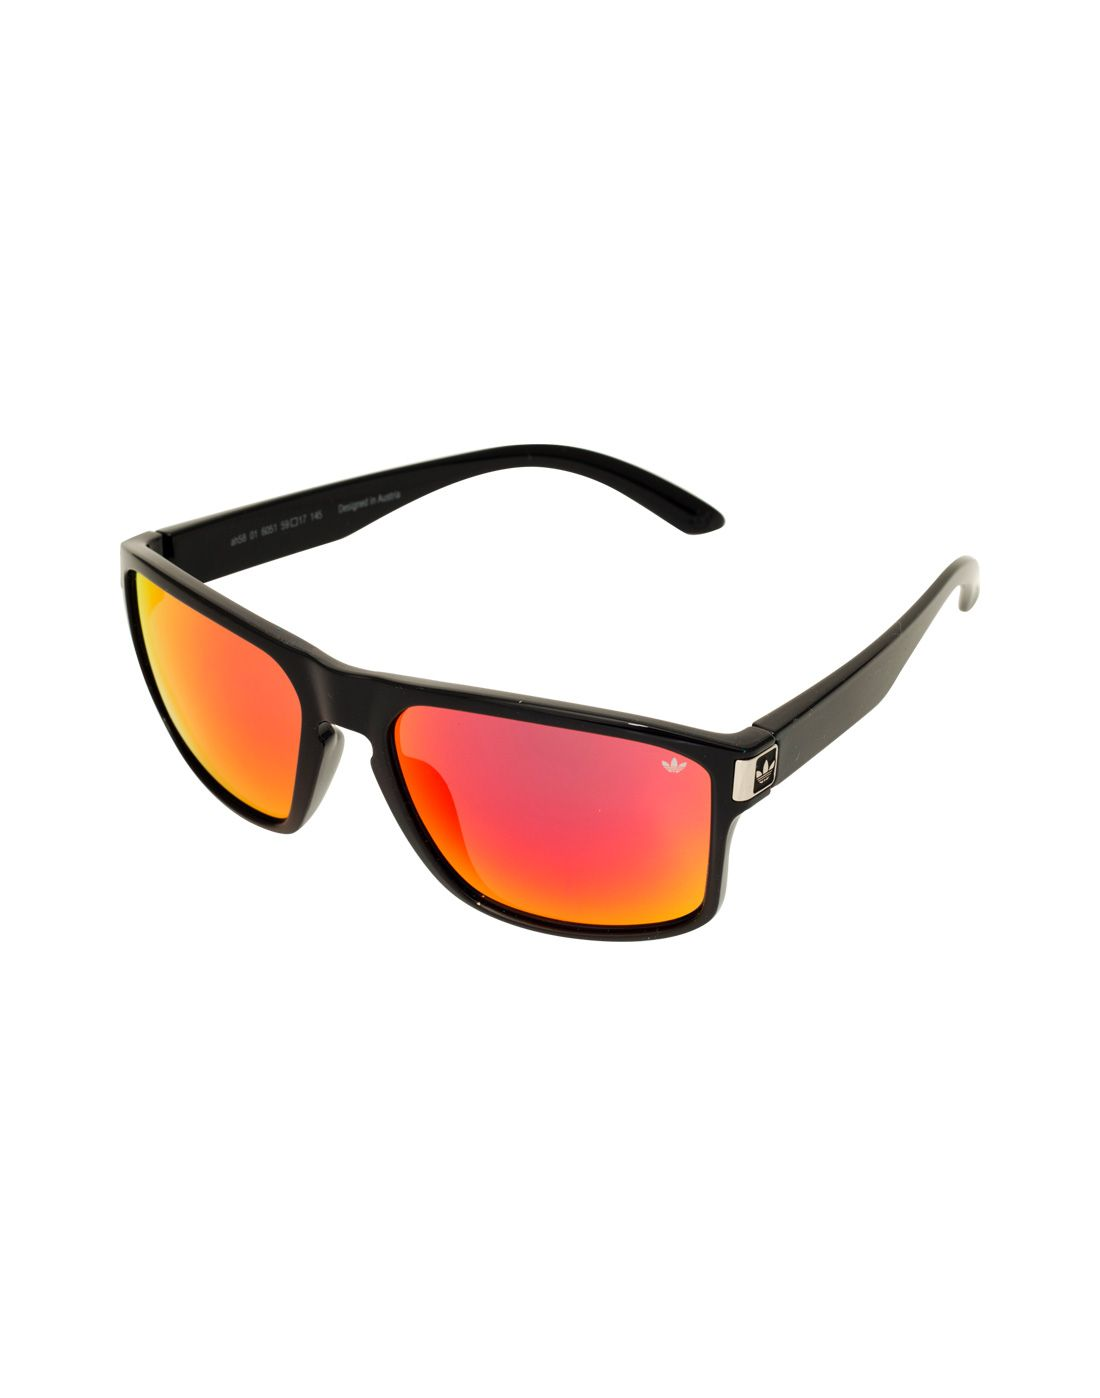 adidas originals malibu sunglasses